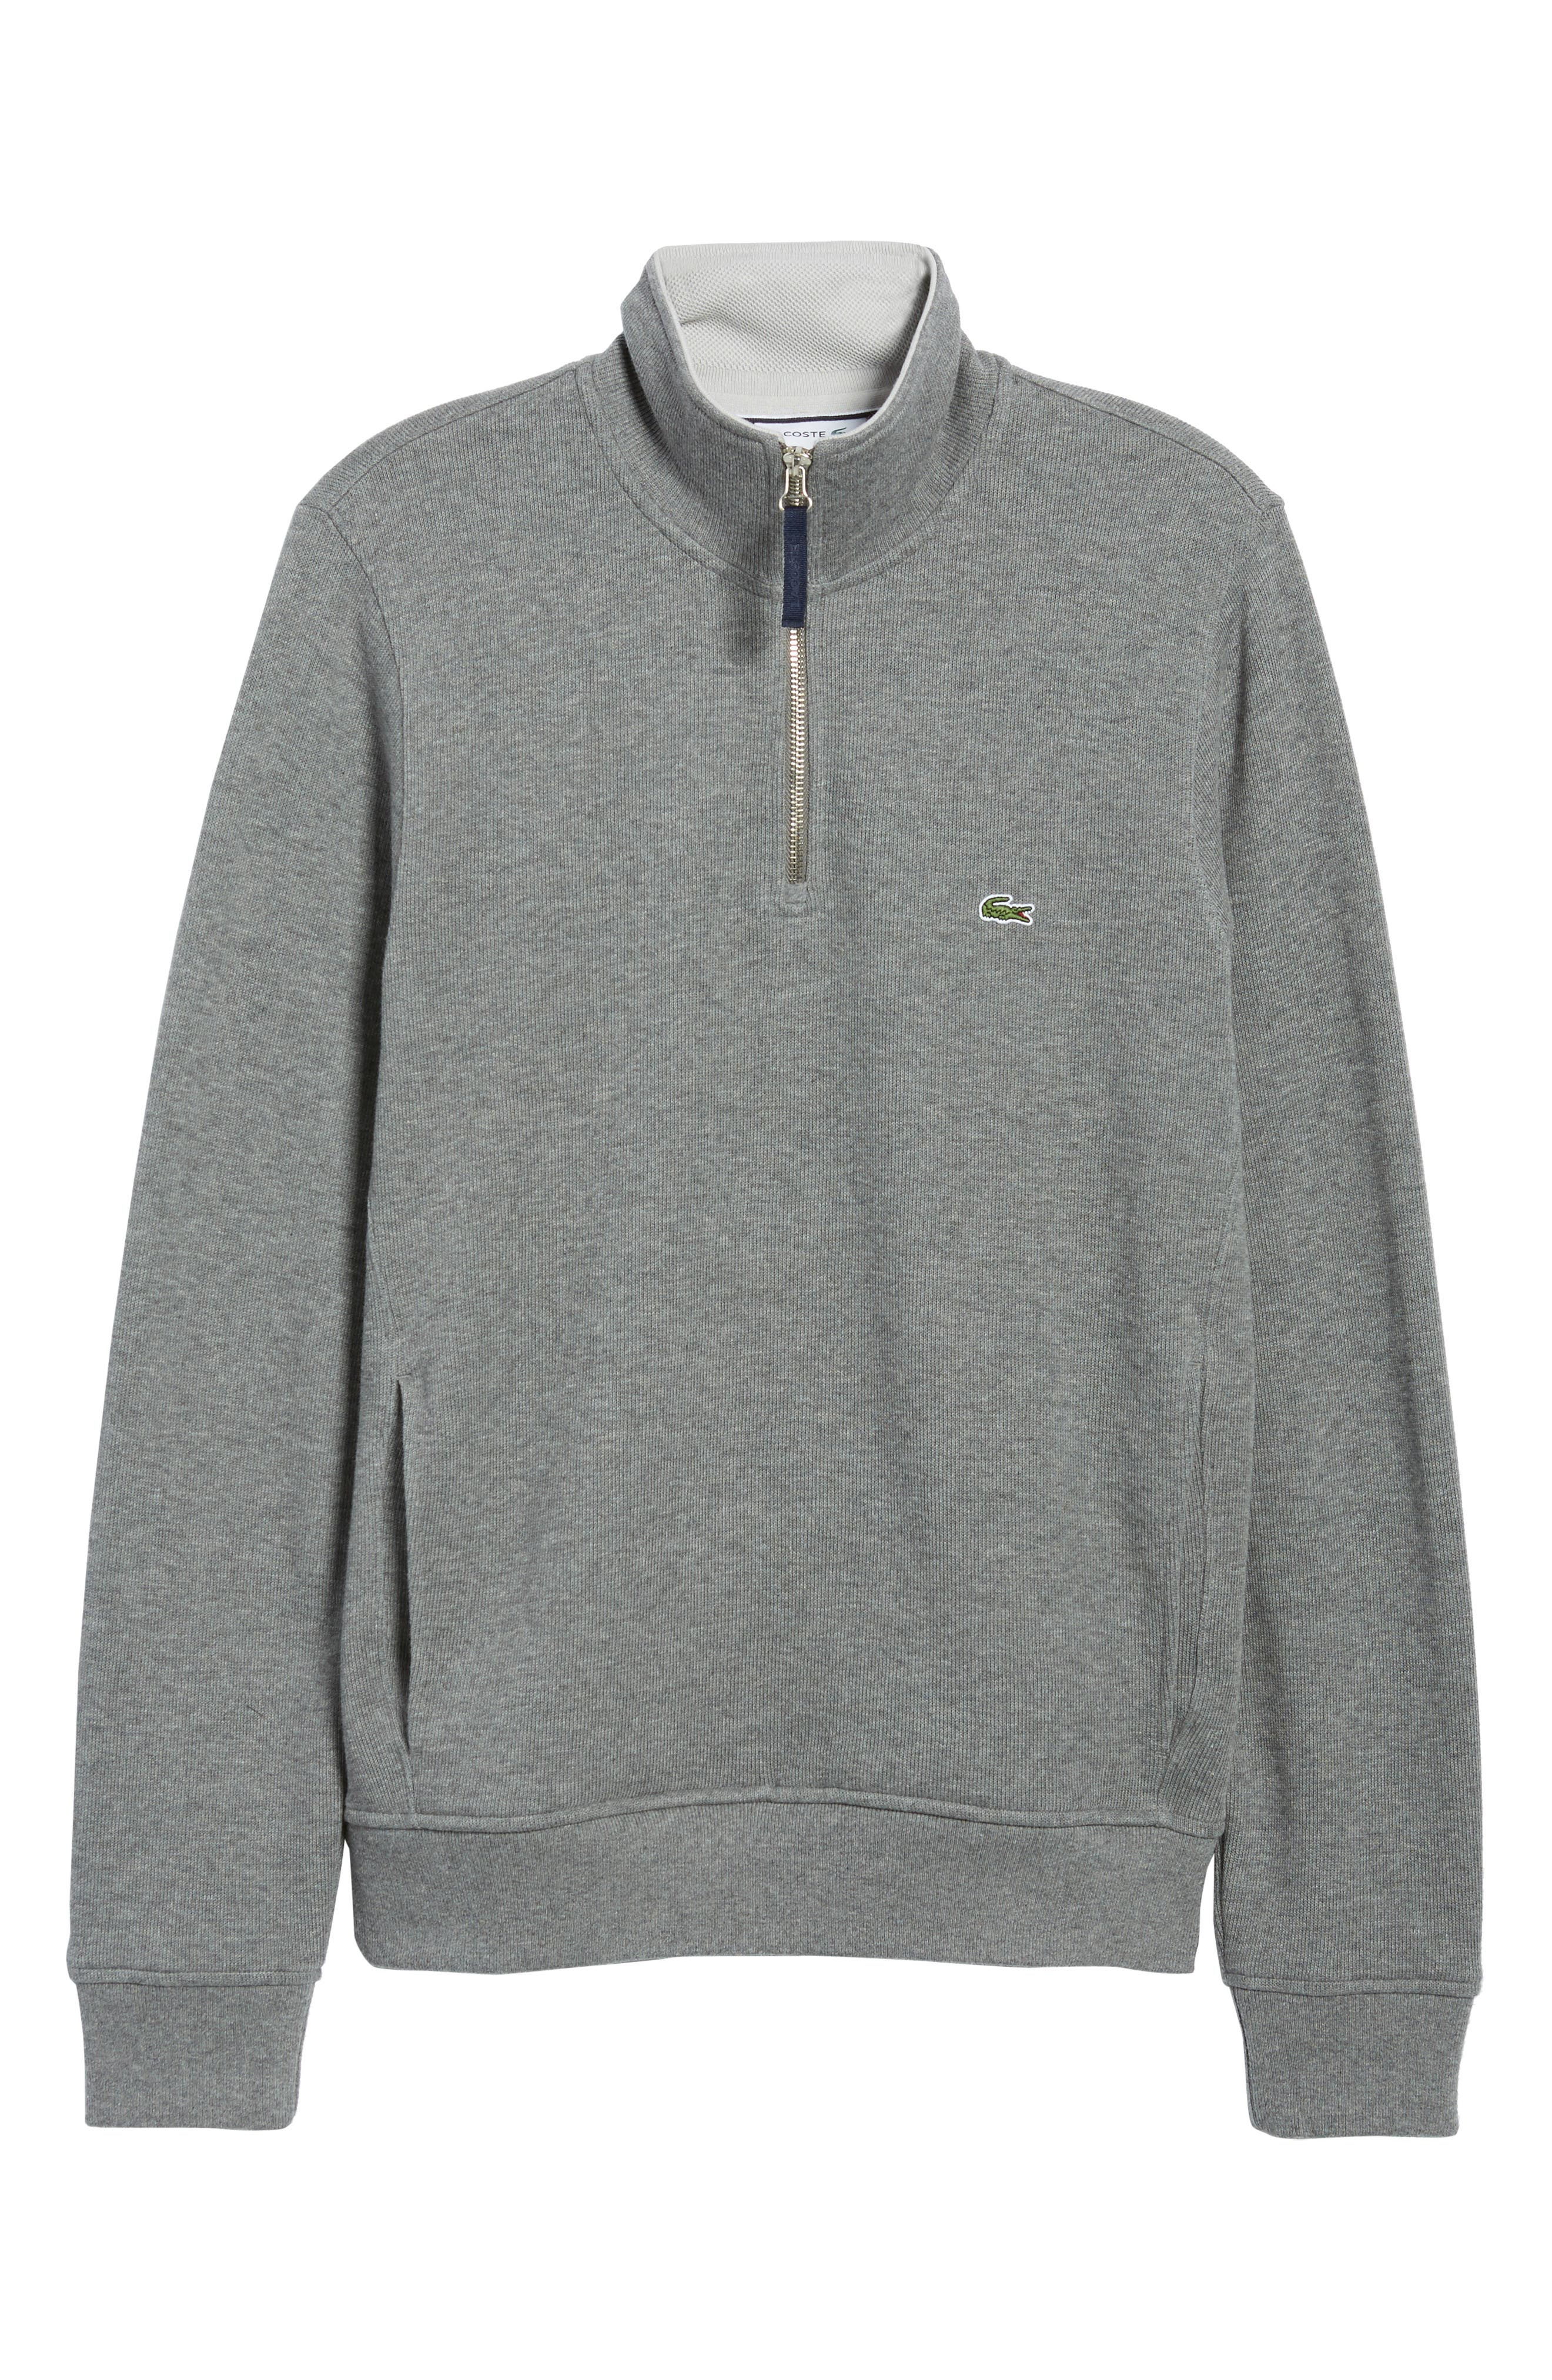 Quarter Zip Cotton Interlock Sweatshirt,                             Alternate thumbnail 6, color,                             GALAXITE CHINE/ NIMBUS